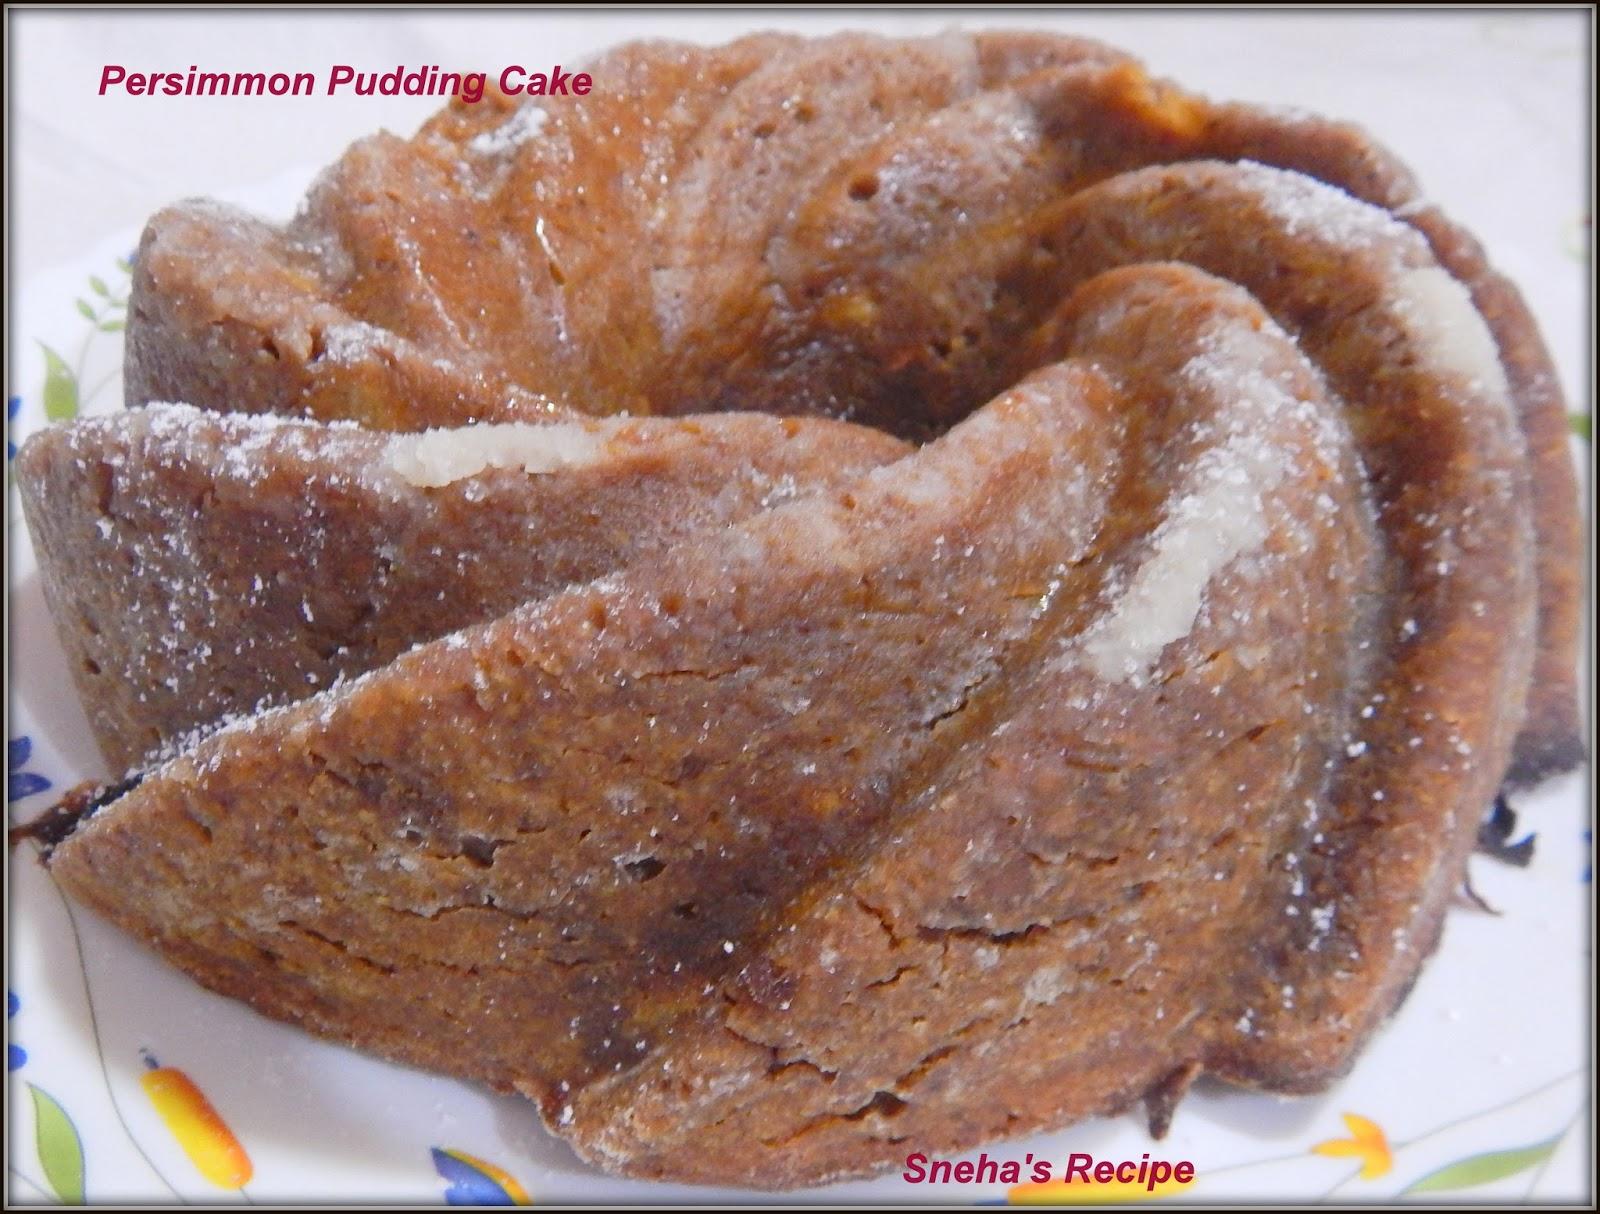 Persimmon Pudding Cake #BundtBakers - Sneha's Recipe